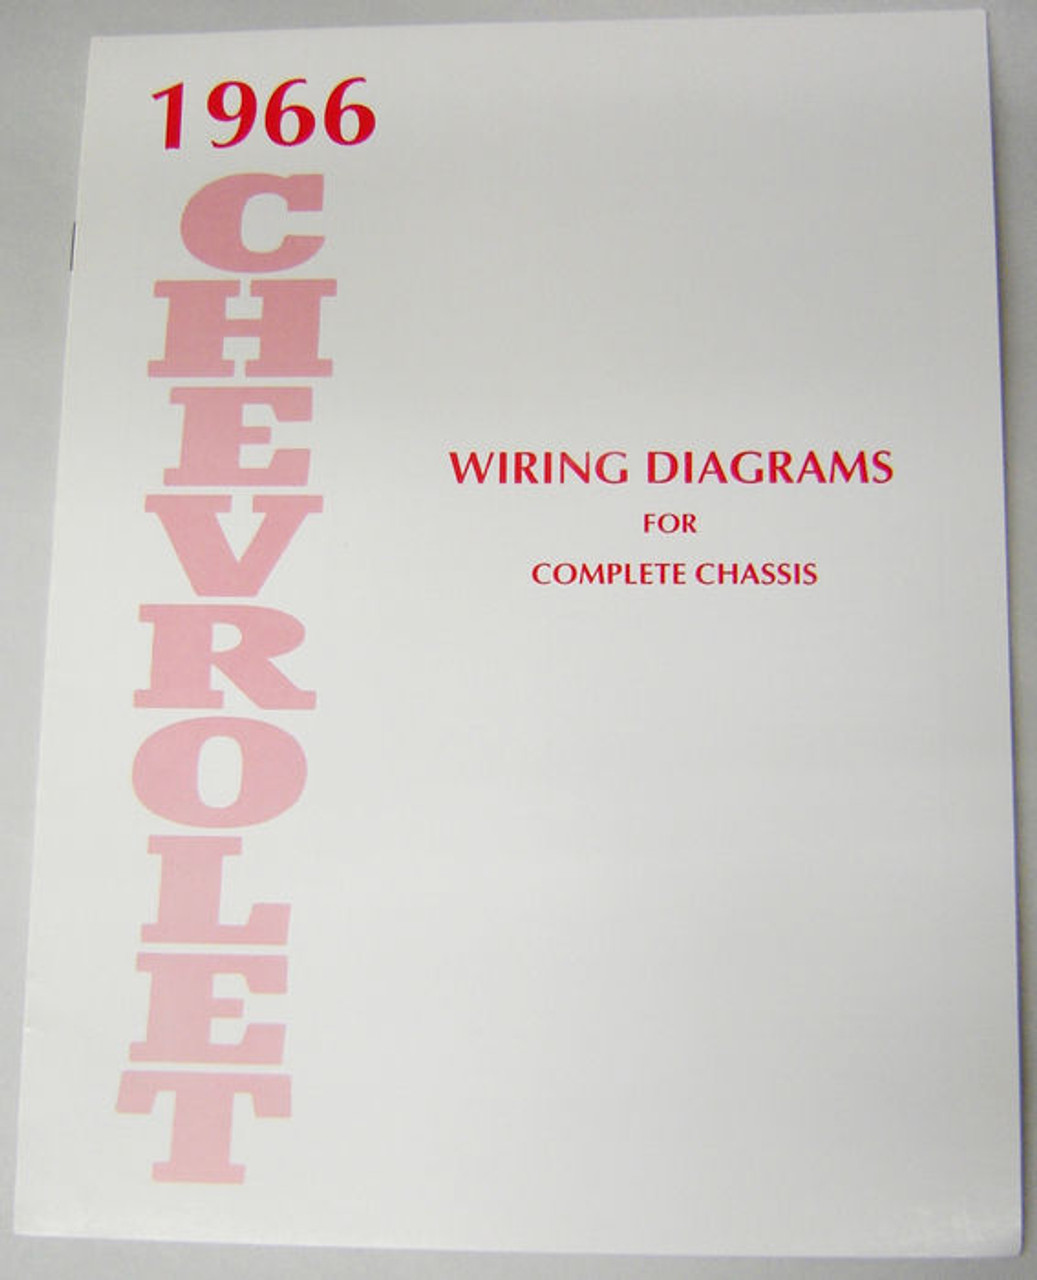 L1022_zpsjouiuker__97070.1443480941?c=2 66 1966 chevy impala electrical wiring diagram manual i 5 1966 chevy impala wiring diagram at bayanpartner.co